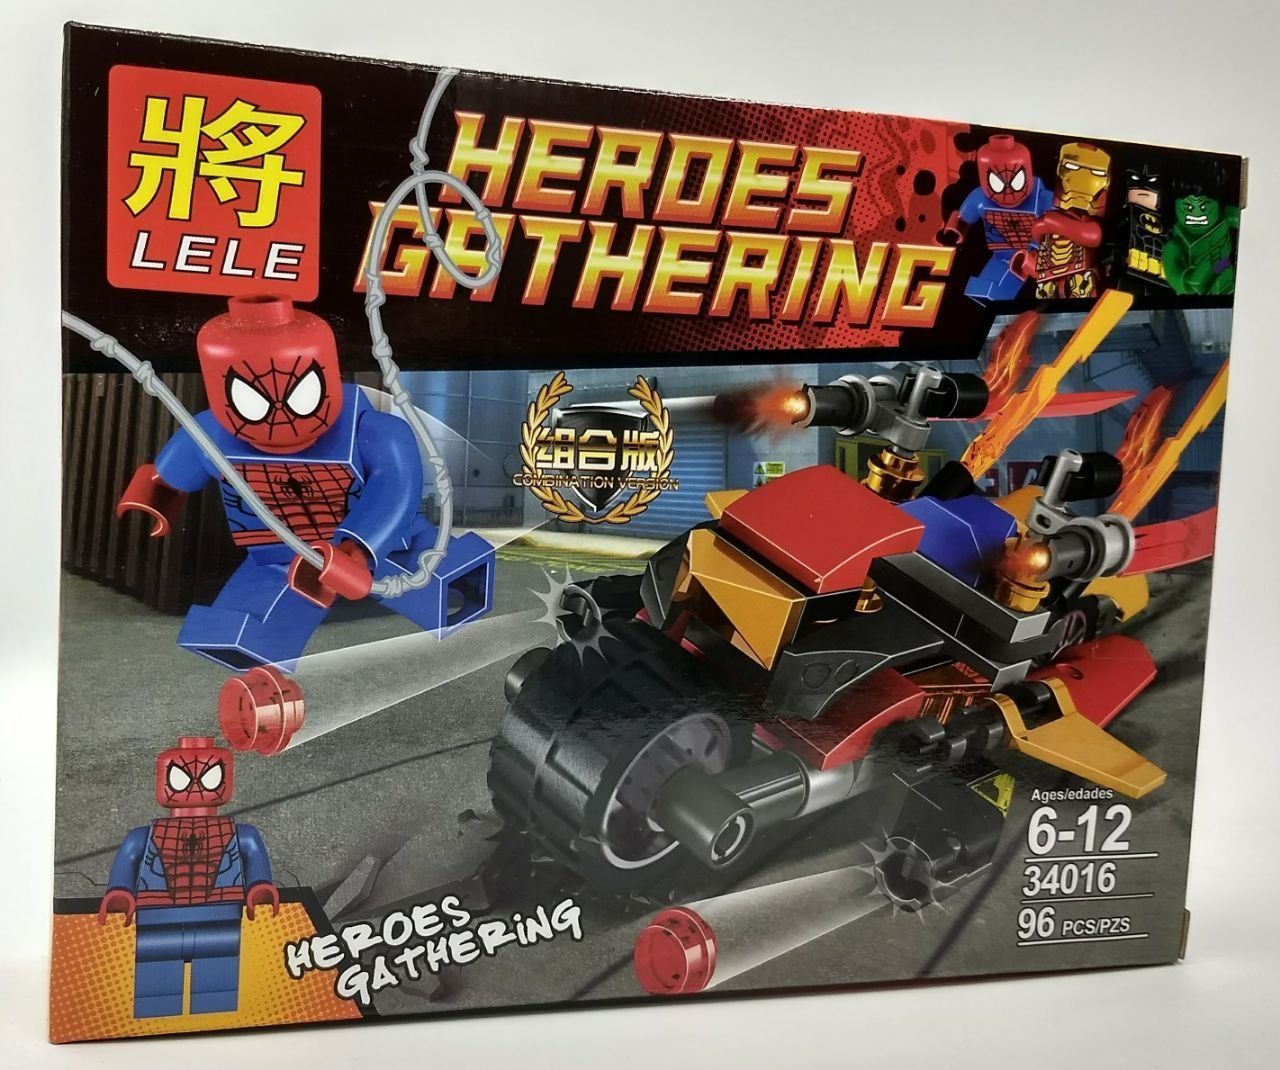 Bloco de Montar Heroes Gathering - Super-herói Aranha 96 pçs